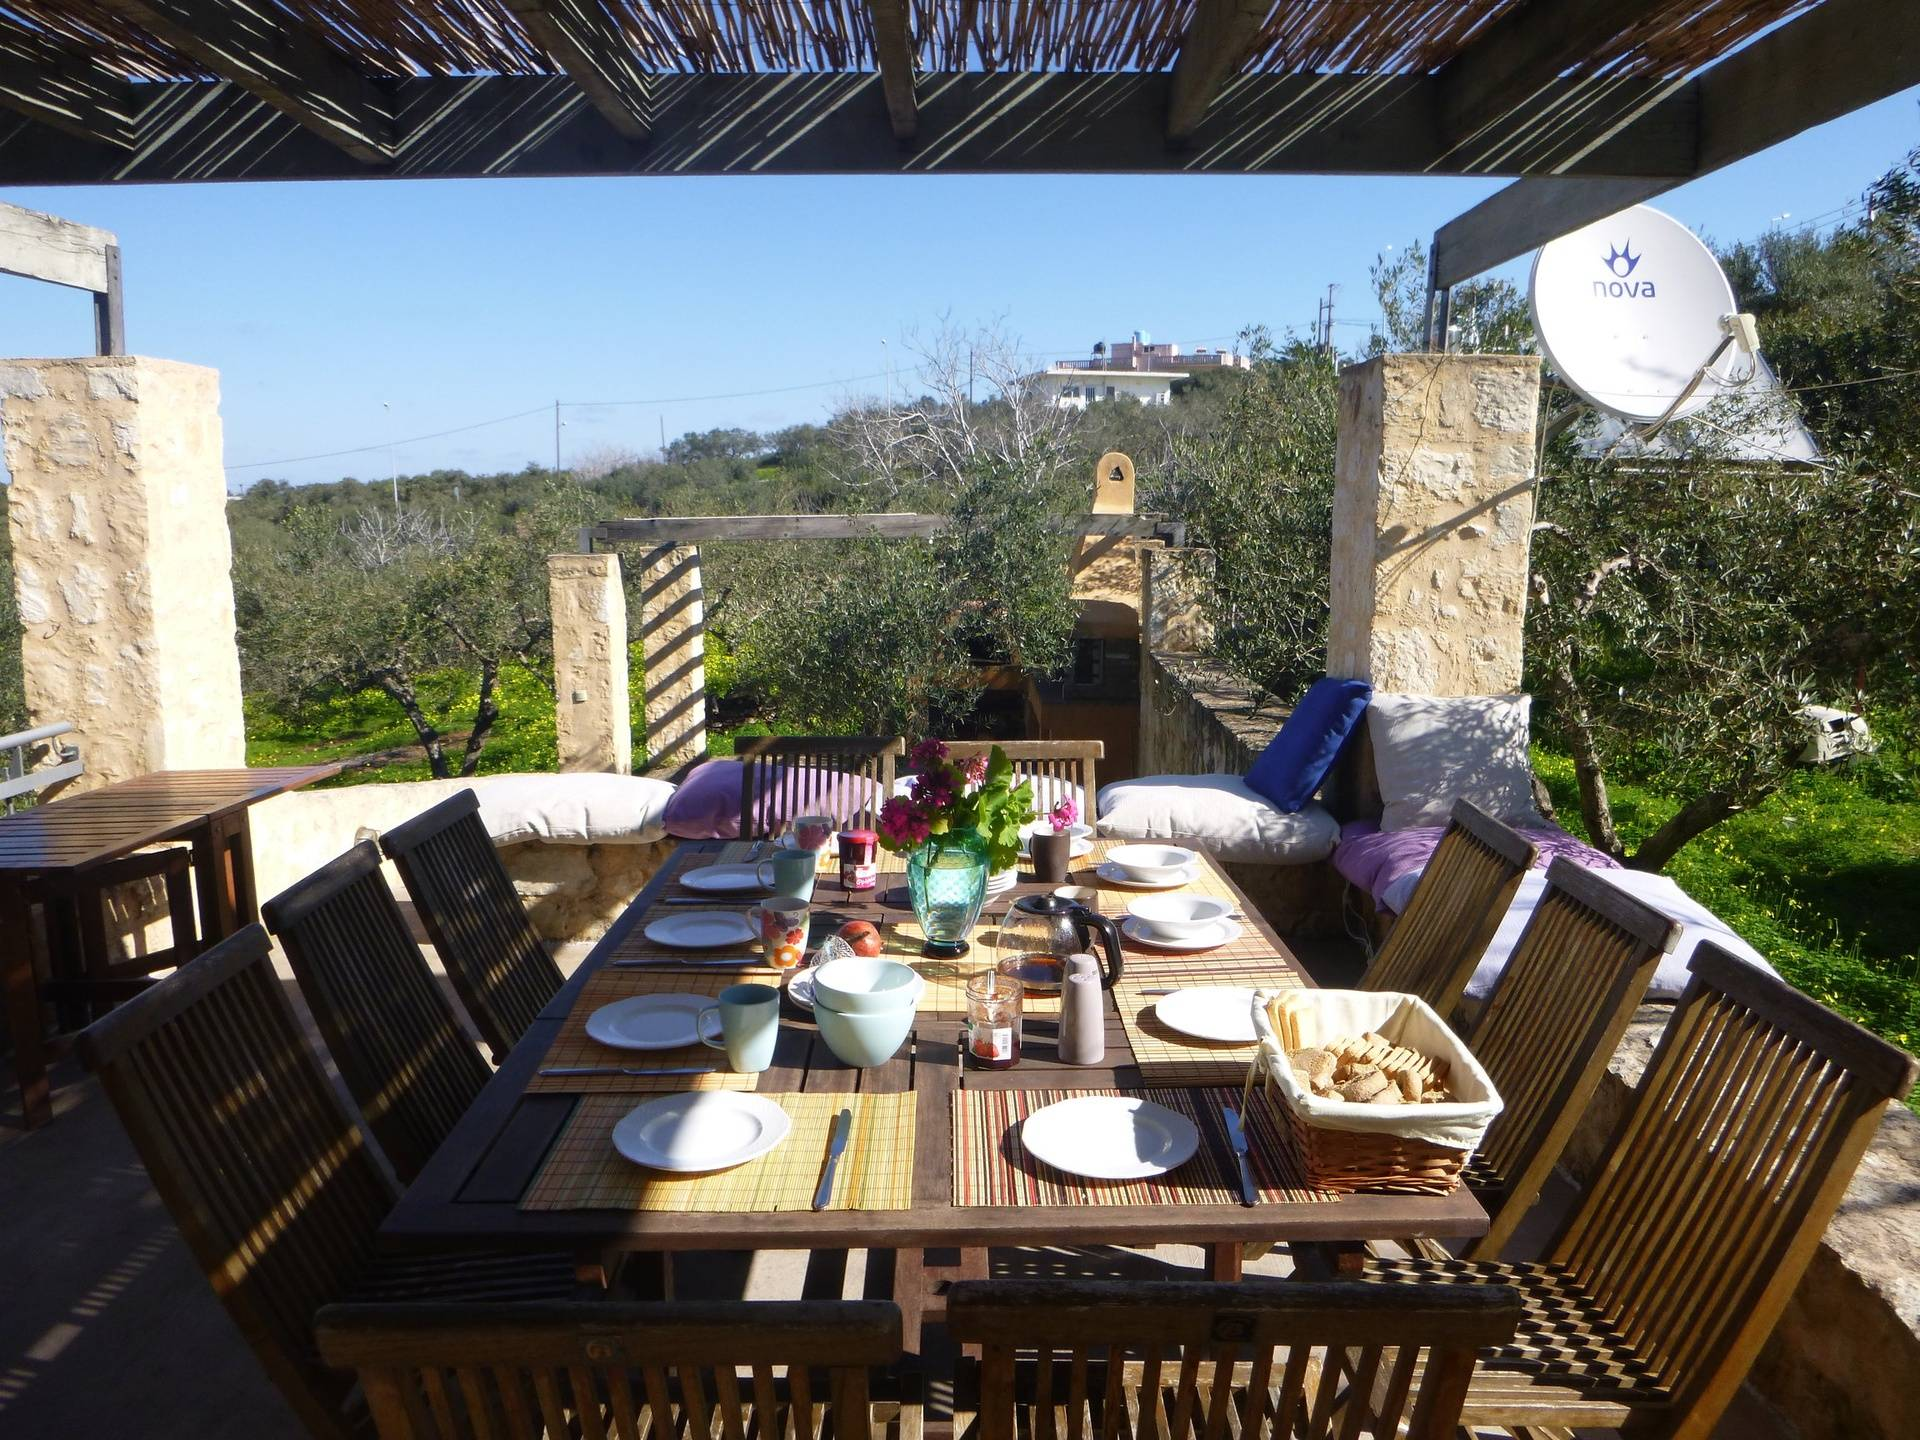 breakfast at the kitchen terrace